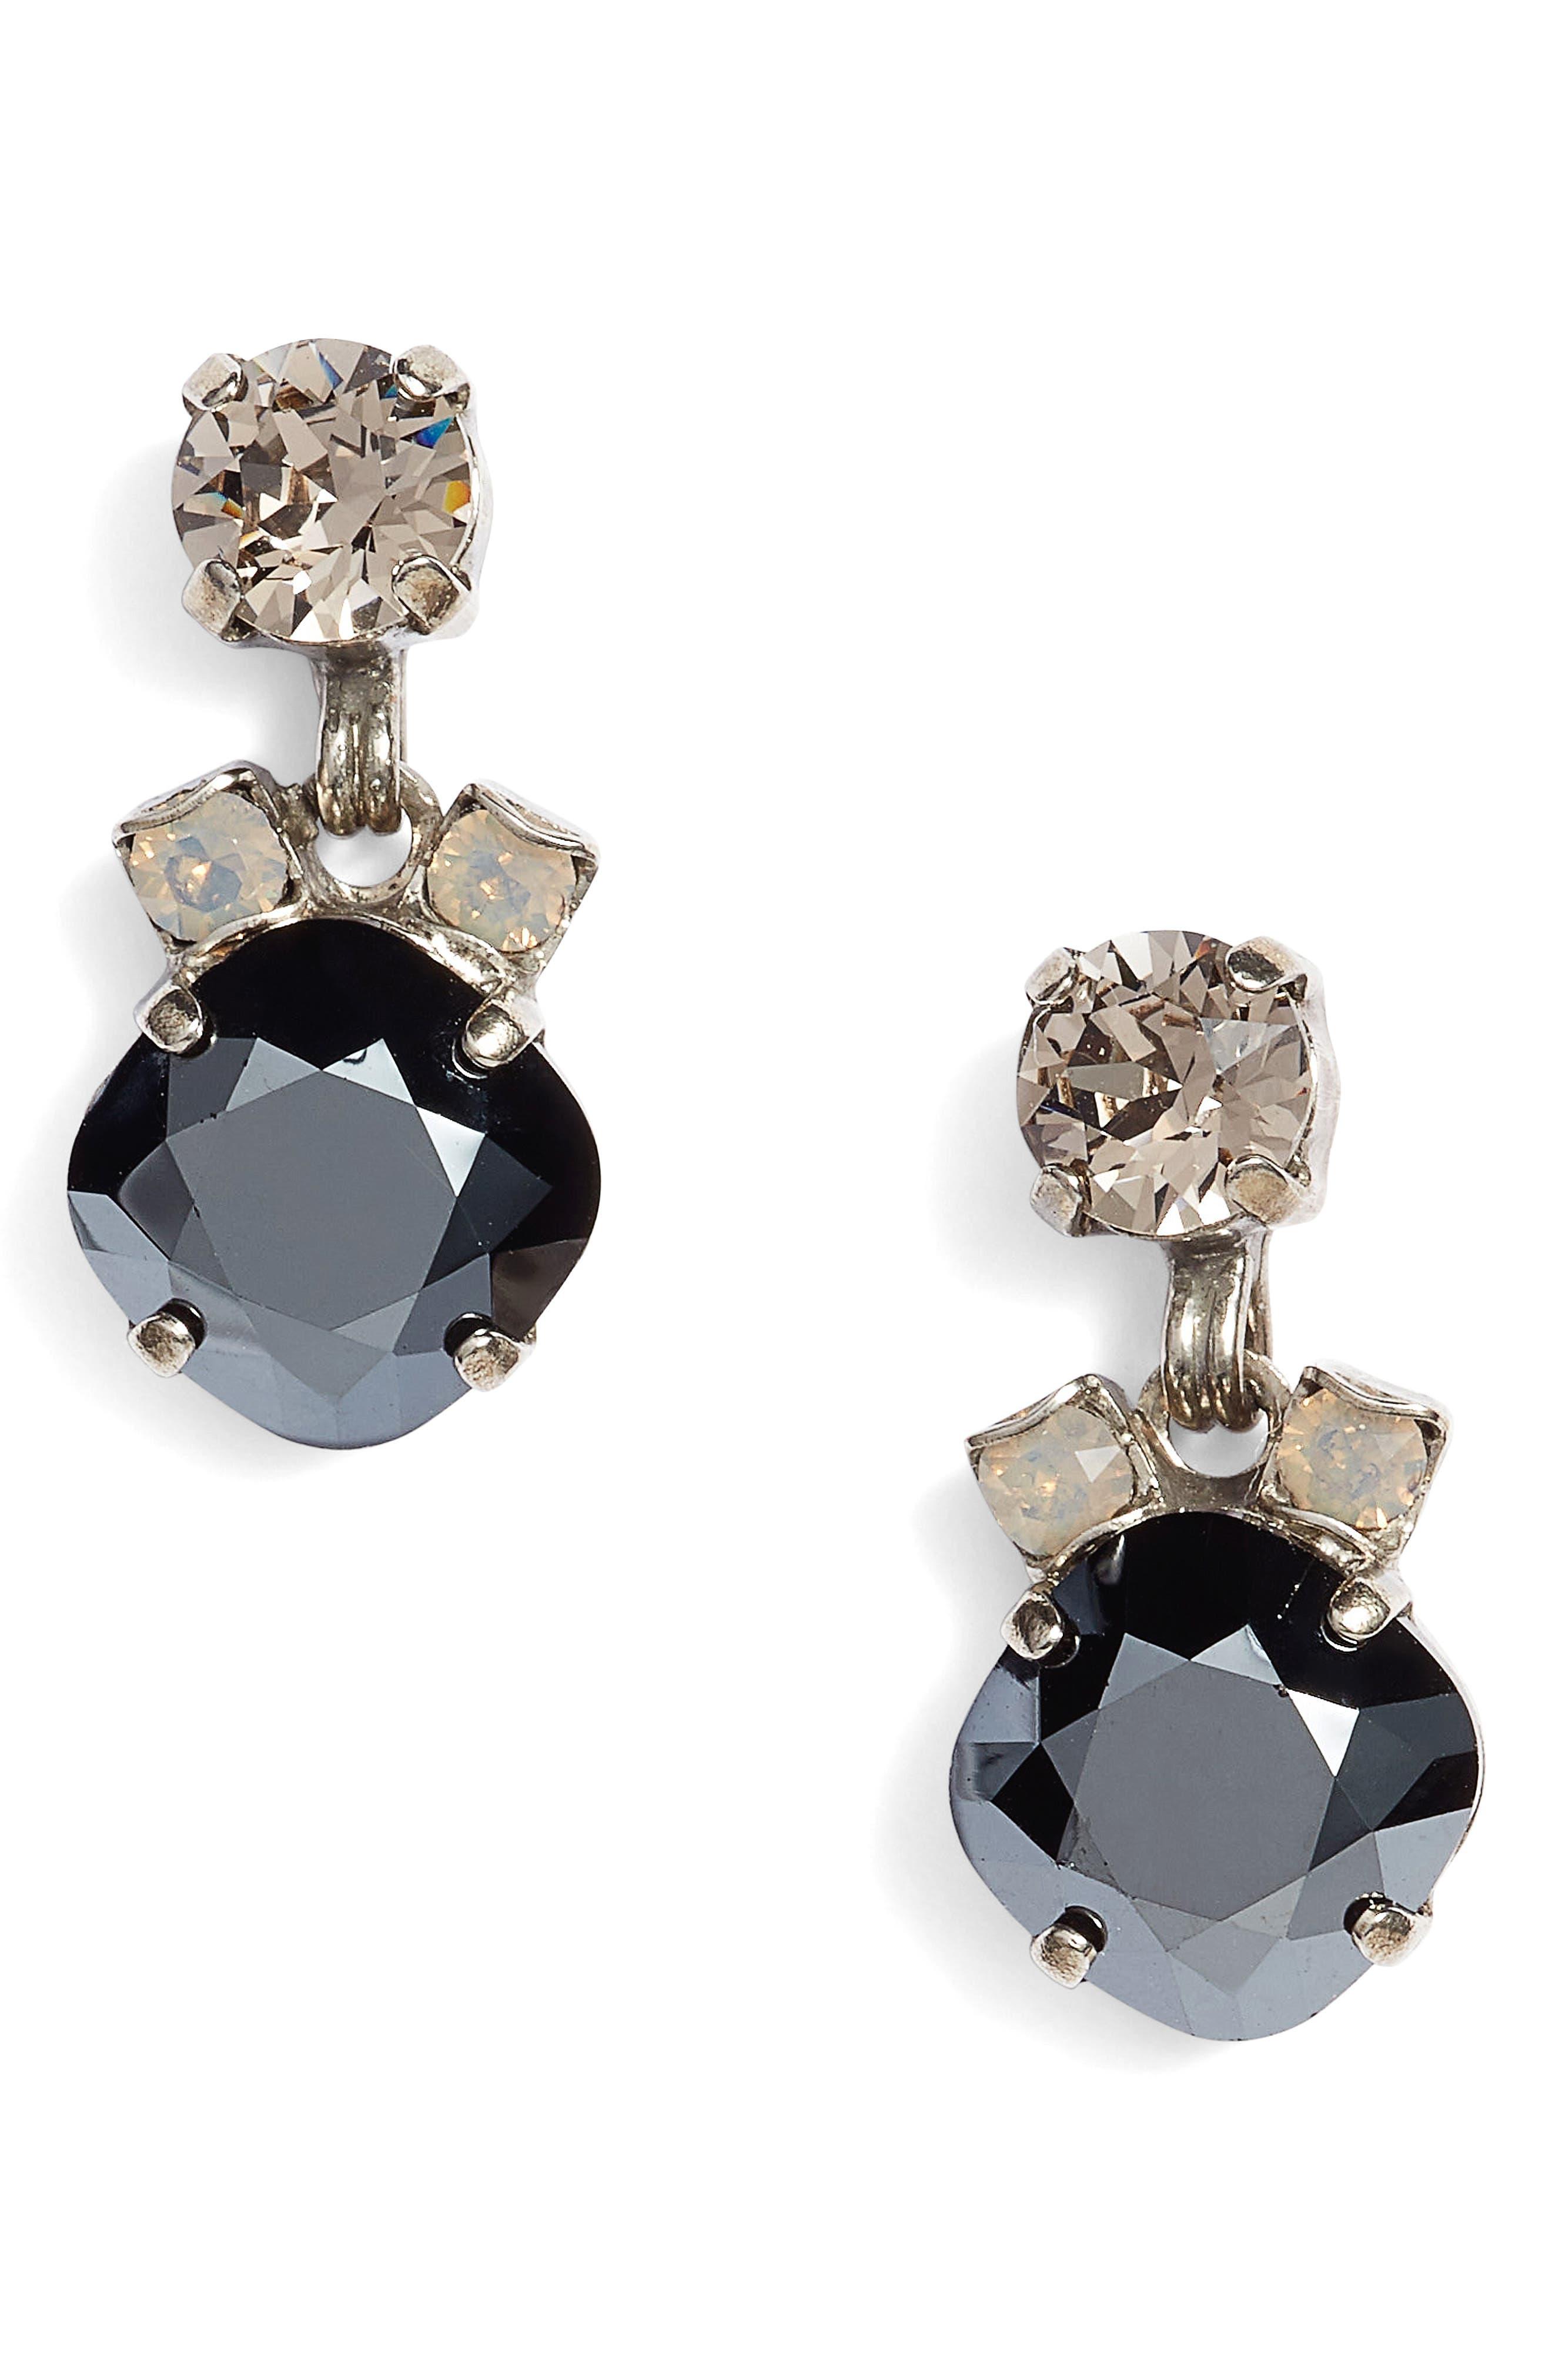 Balsam Crystal Drop Earrings,                             Main thumbnail 1, color,                             001